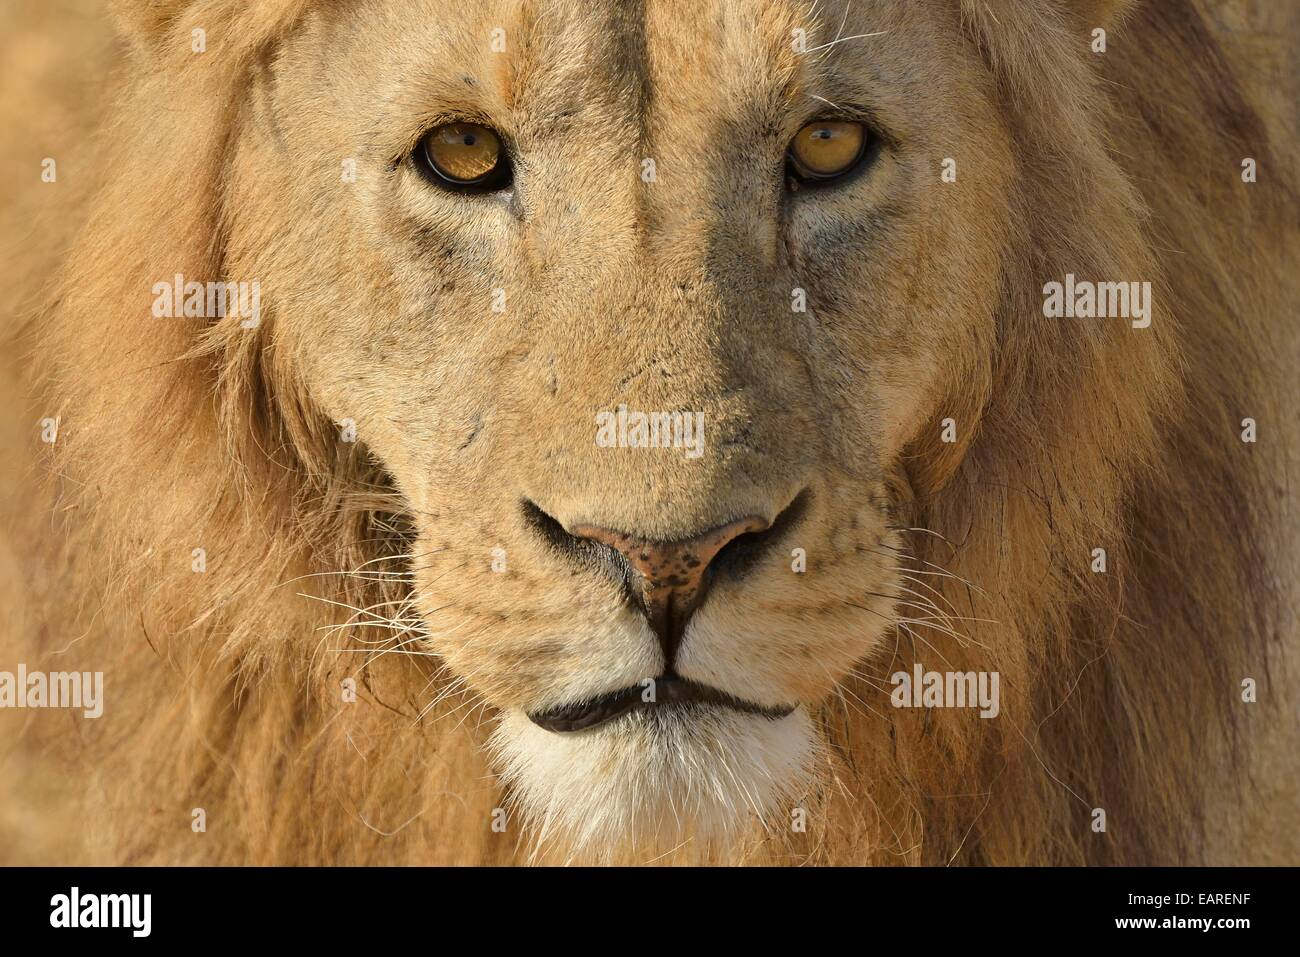 Lion (Panthera leo), with a mane, portrait, Ngorongoro, Serengeti, Tanzania - Stock Image